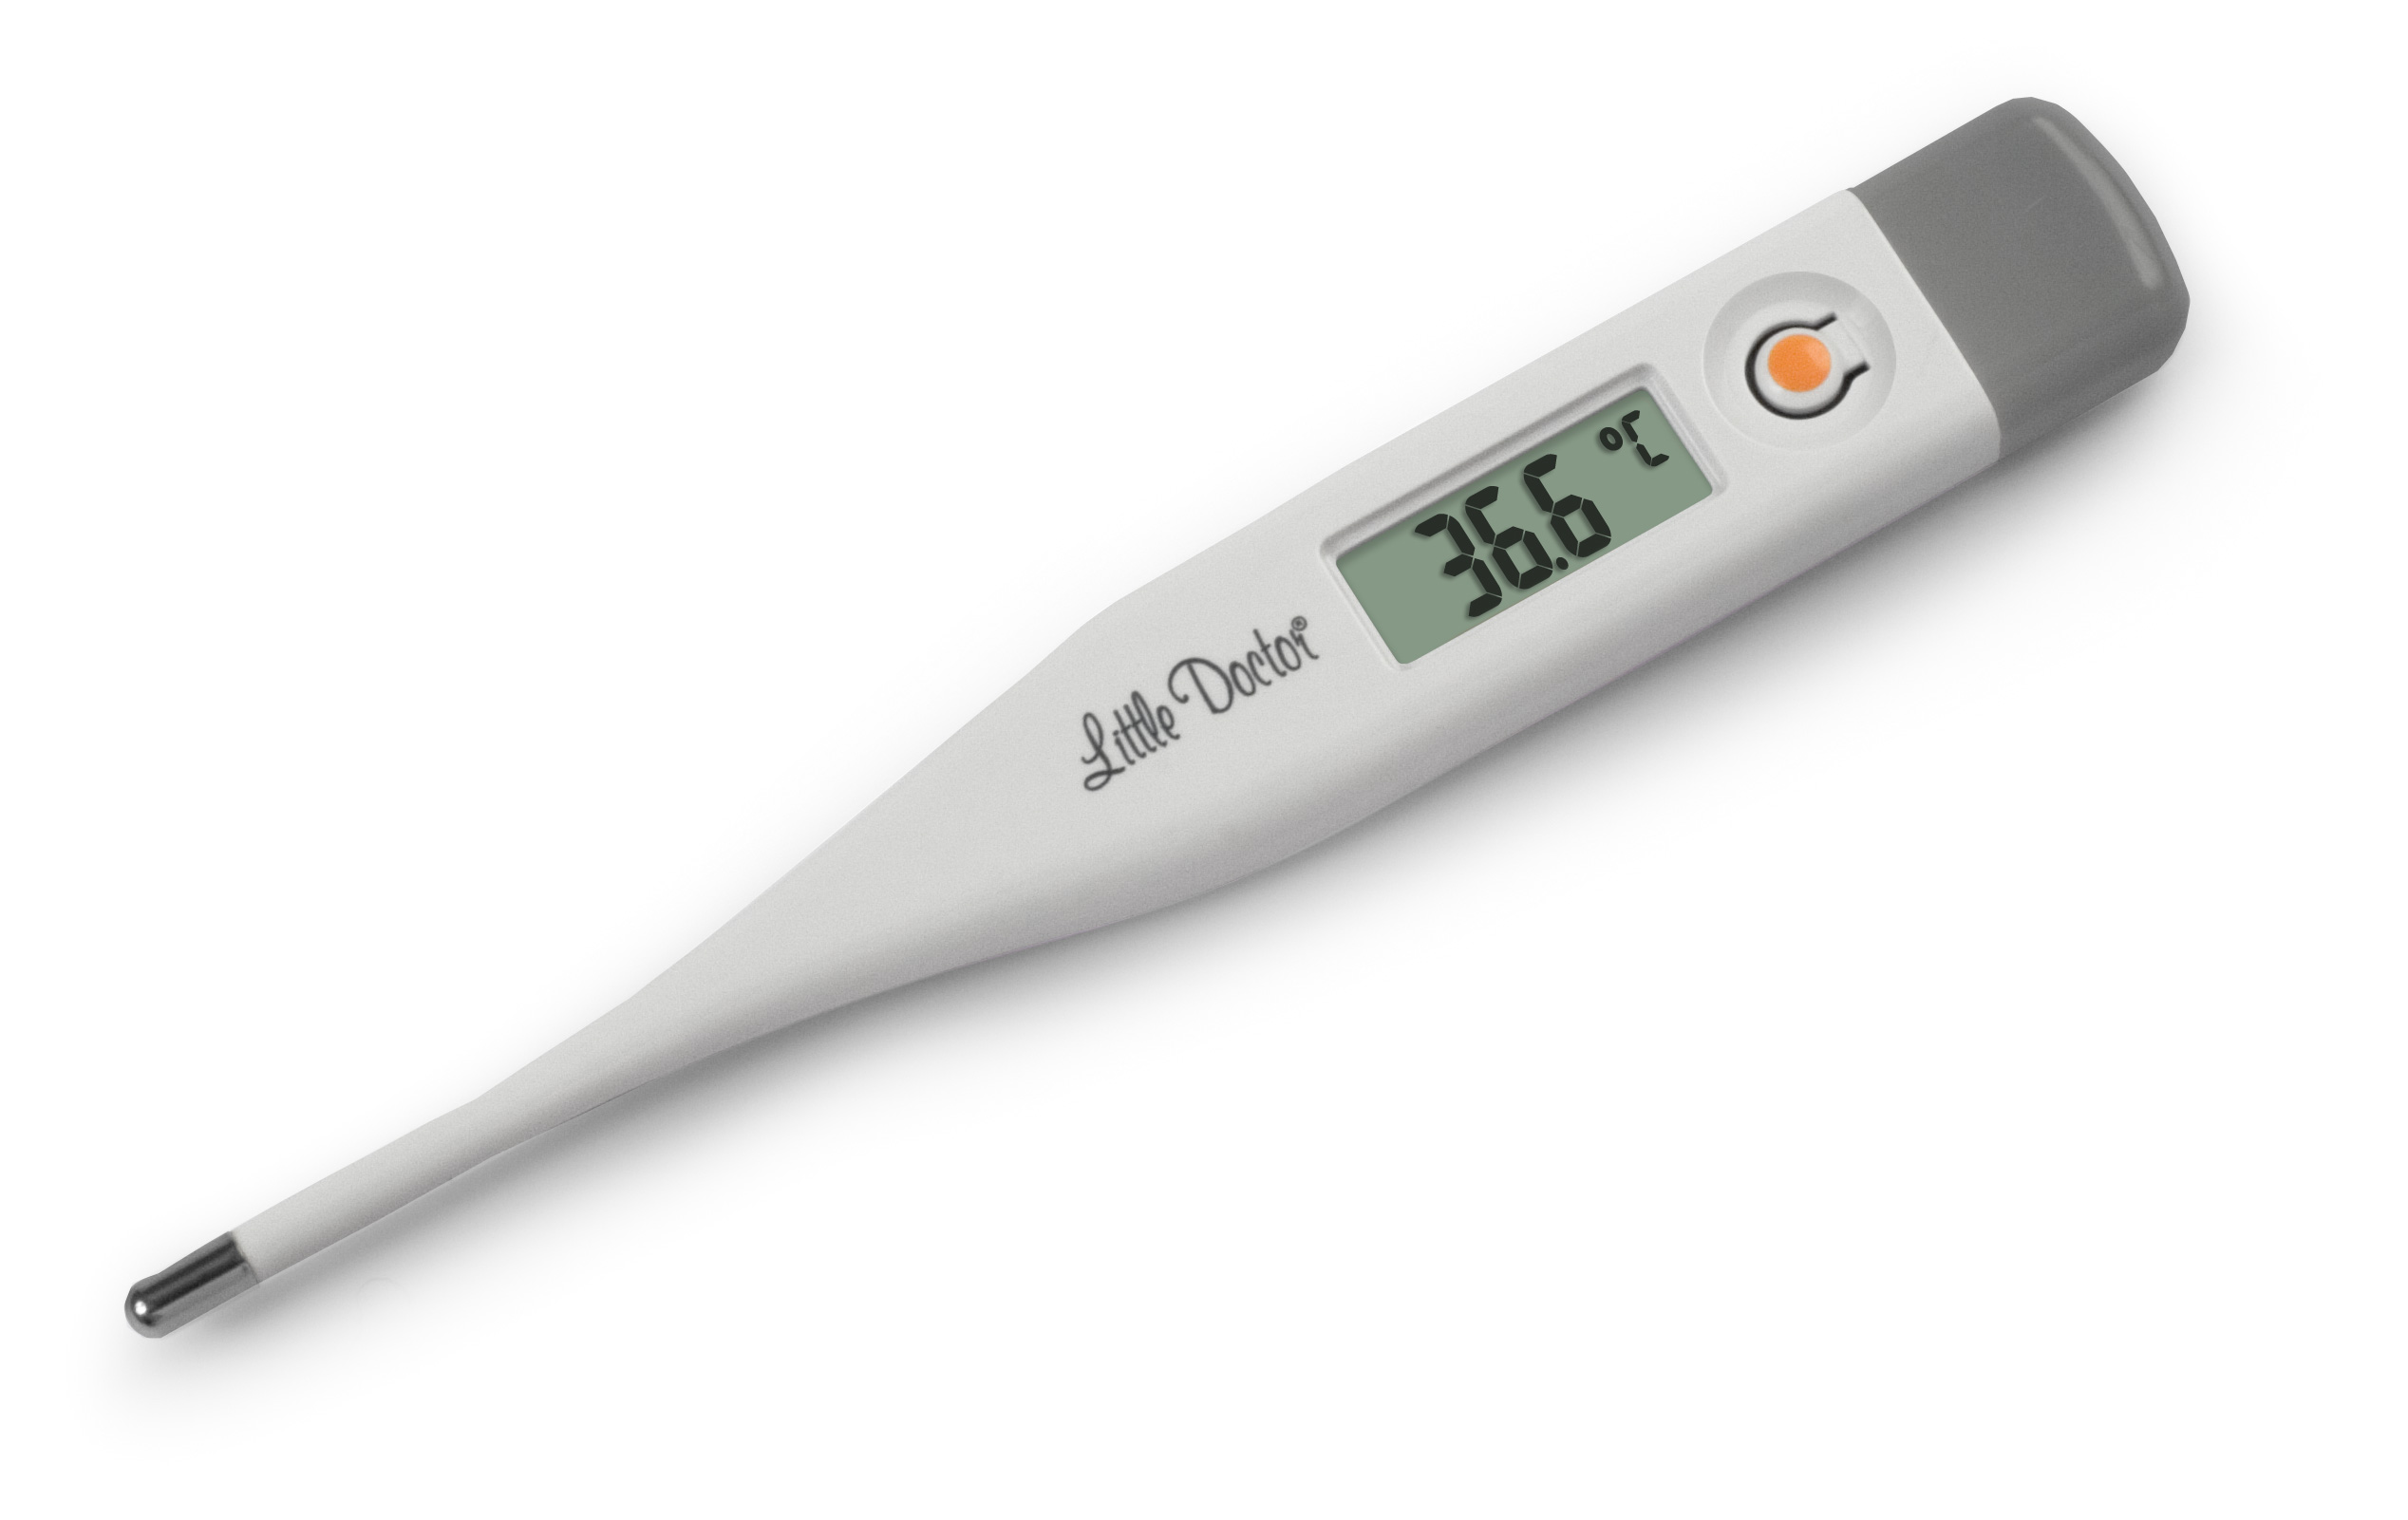 Термометр Little Doctor LD 300 цифровой электронный